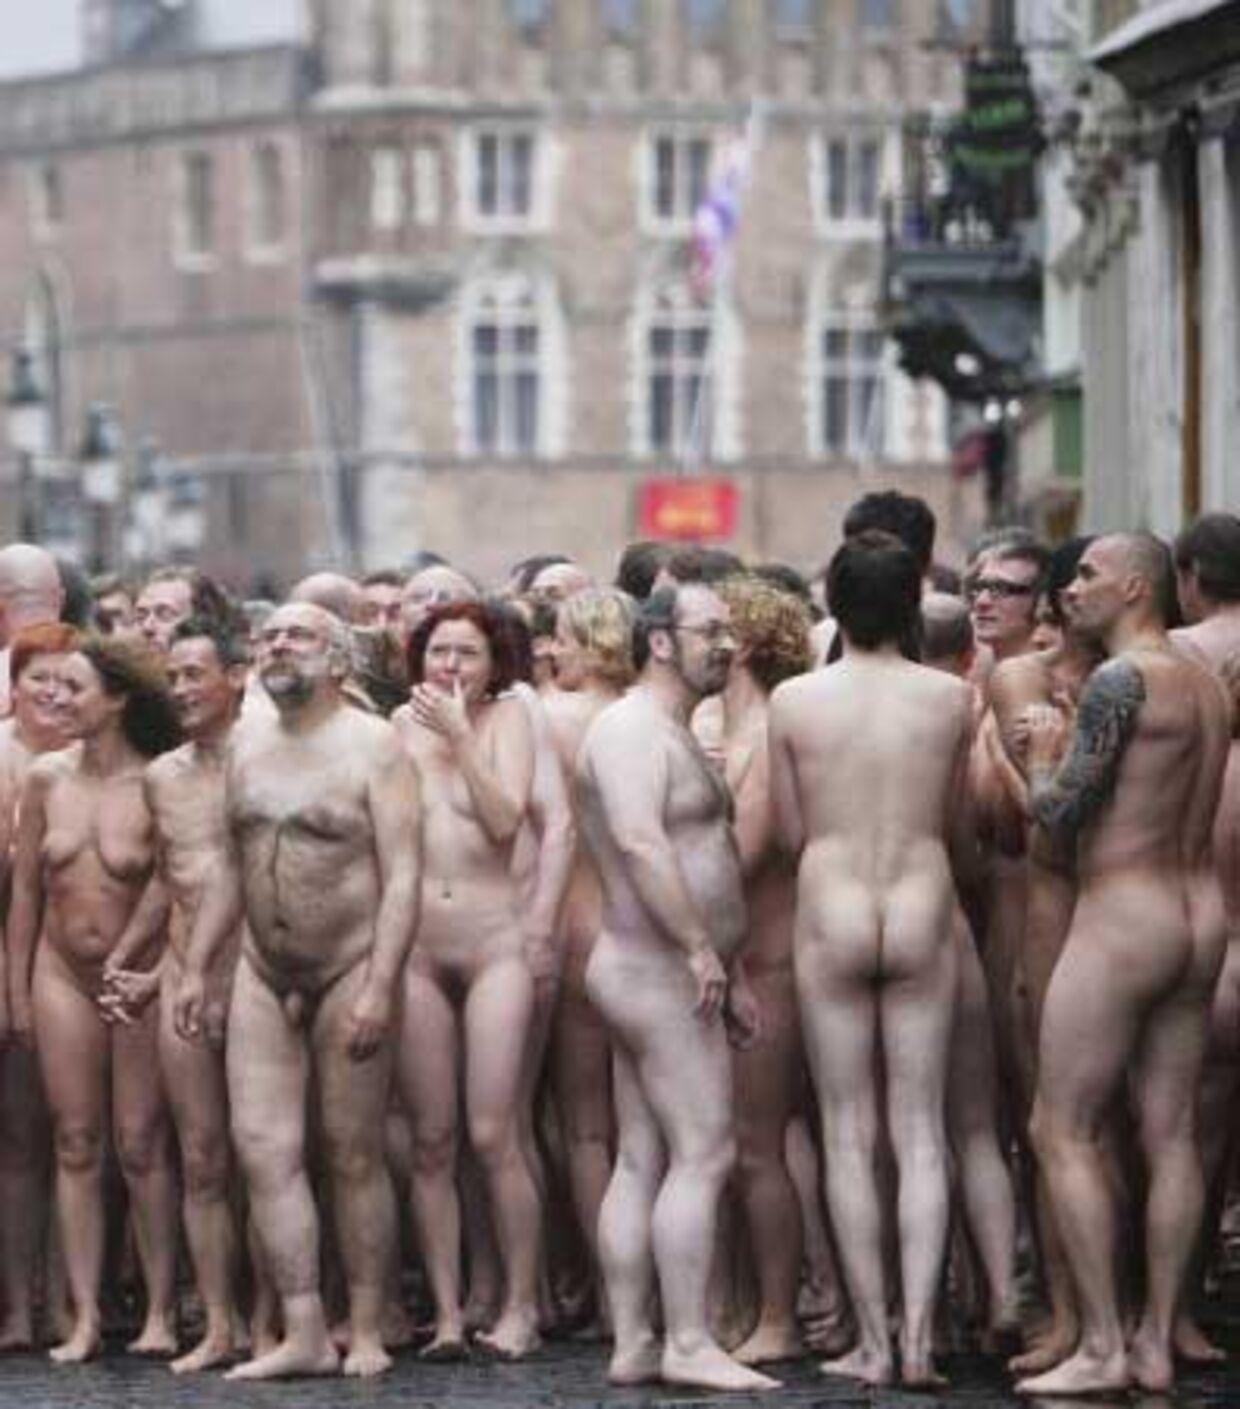 Trinny susannah desnuda foto